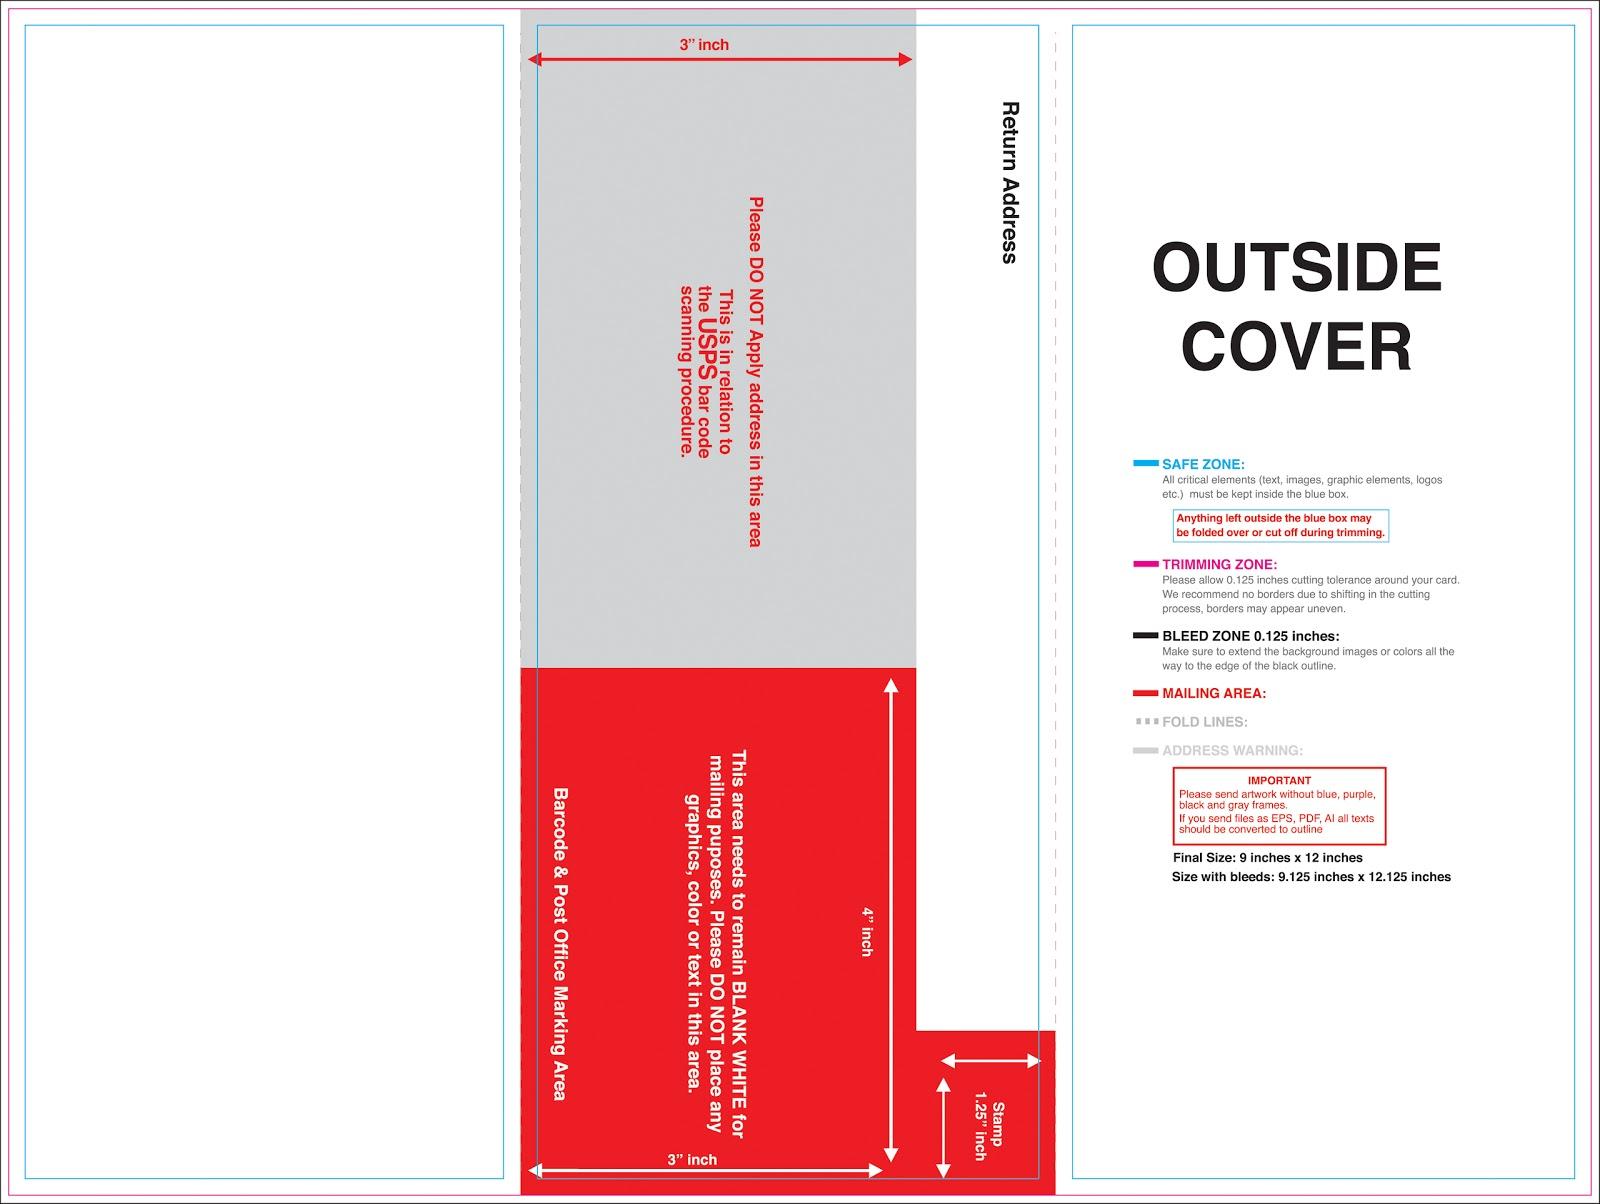 Brochure samples pics brochure mailing for Brochure mailer template